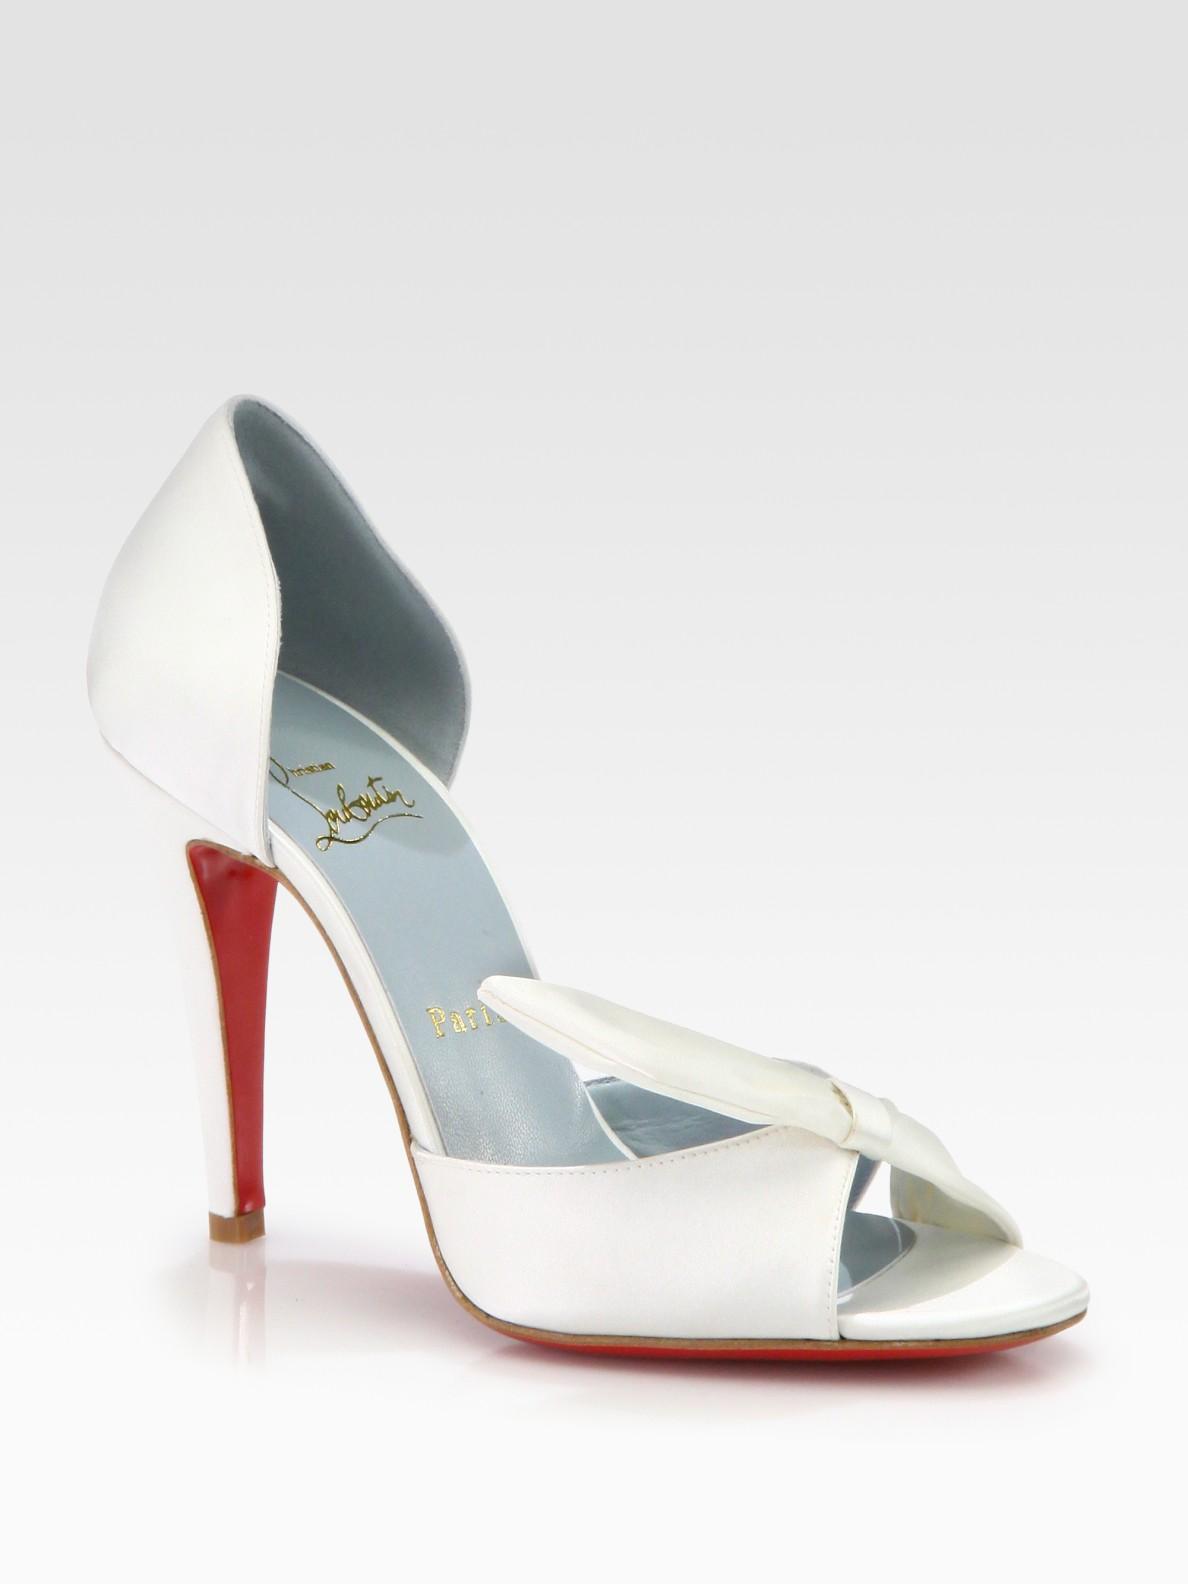 43b26fd9ddb closeout christian louboutin bridal shoes lyst christian louboutin livrée  satin bridal pump in white fb8cc 2f3f1